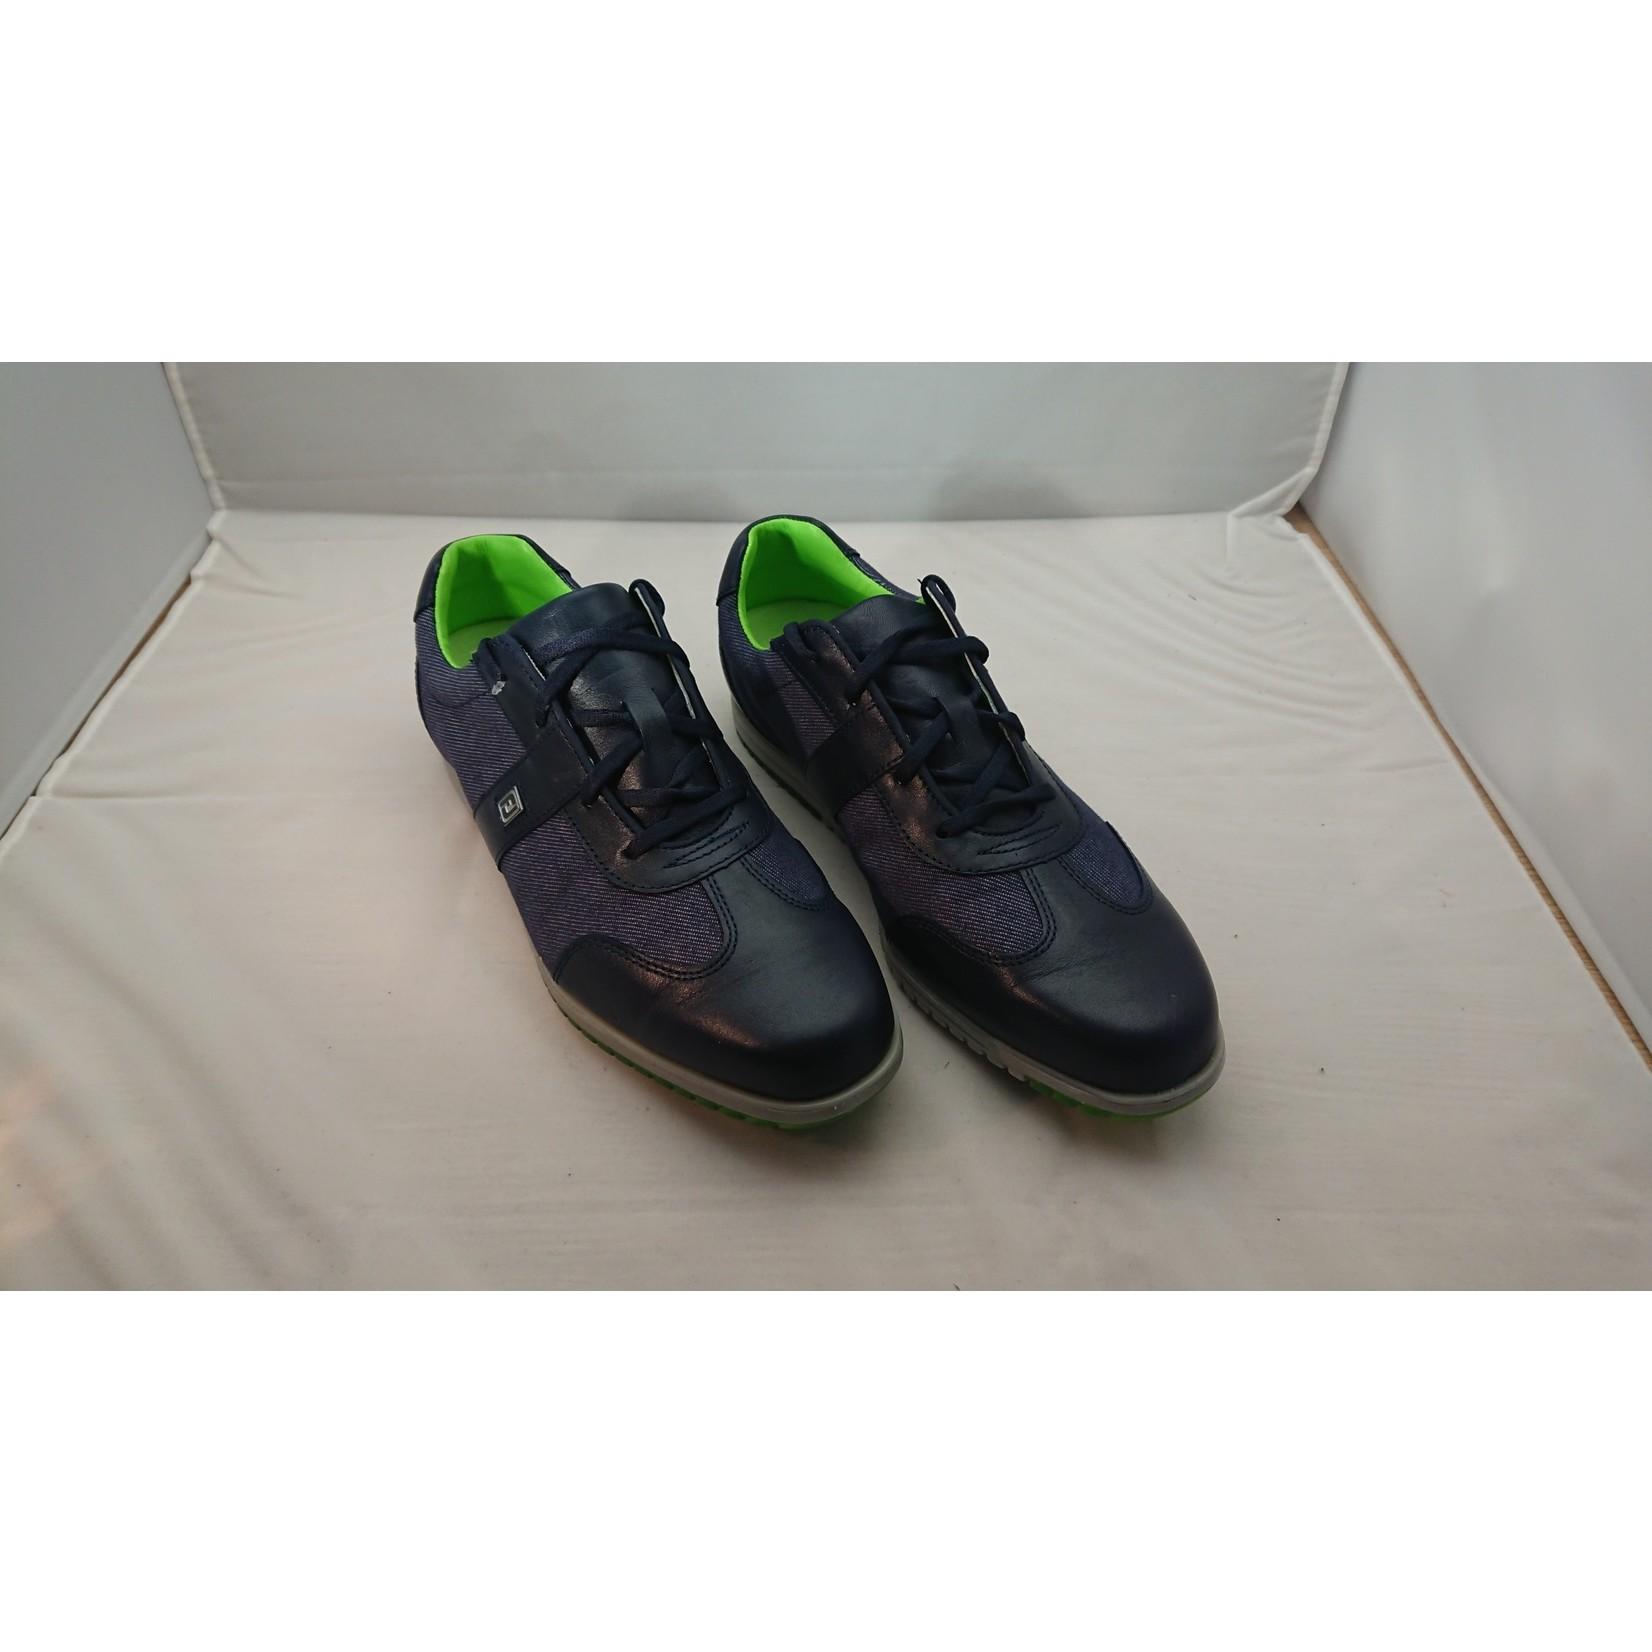 Footjoy Footjoy Casual Collection Blauw 40.5